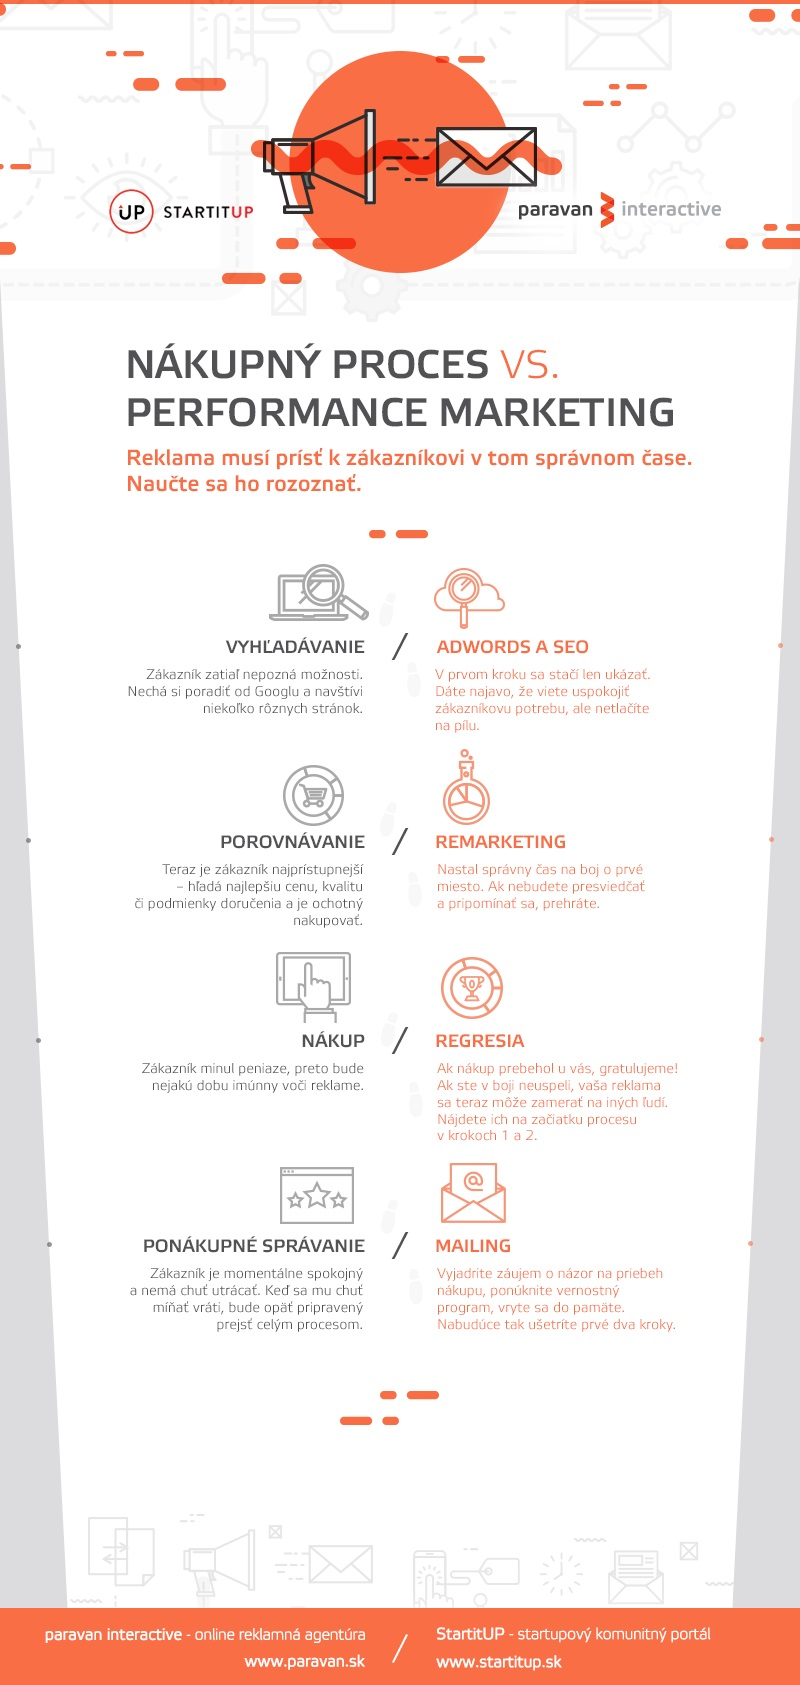 nakupny-proces-vs-performance-marketing-infografika